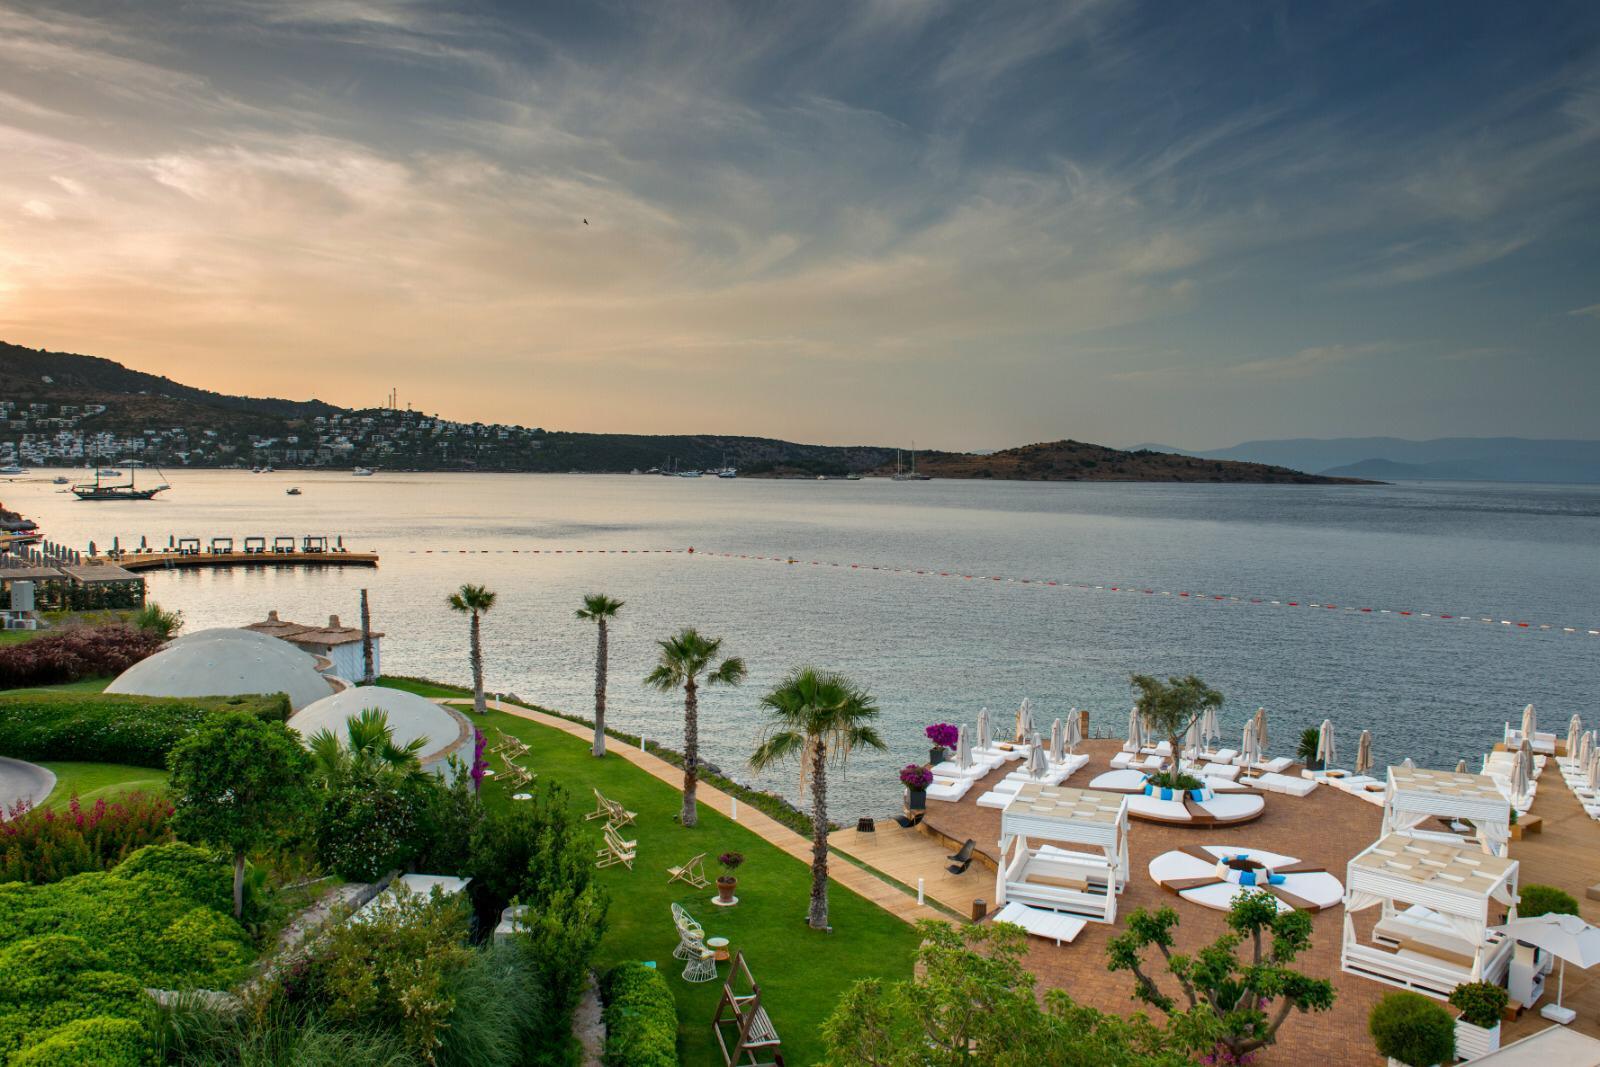 Bodrum-Kuum-Villas-property-turkey-istanbul-006.jpg